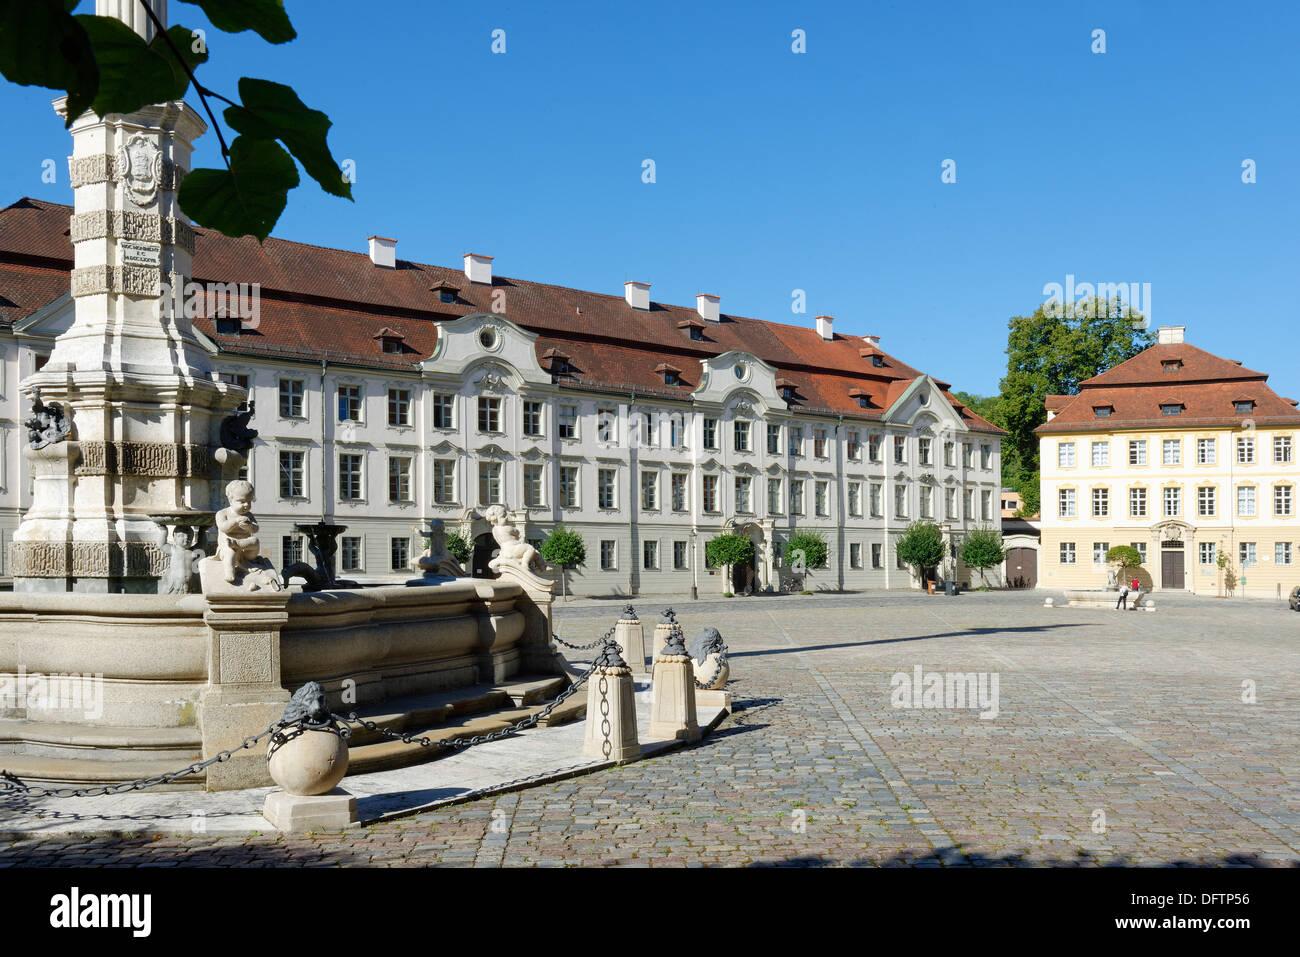 Kavaliershoefe courtyards and the former home of the Vicar General, Residenzplatz square, Altmühltal, Eichstätt, Upper Bavaria - Stock Image